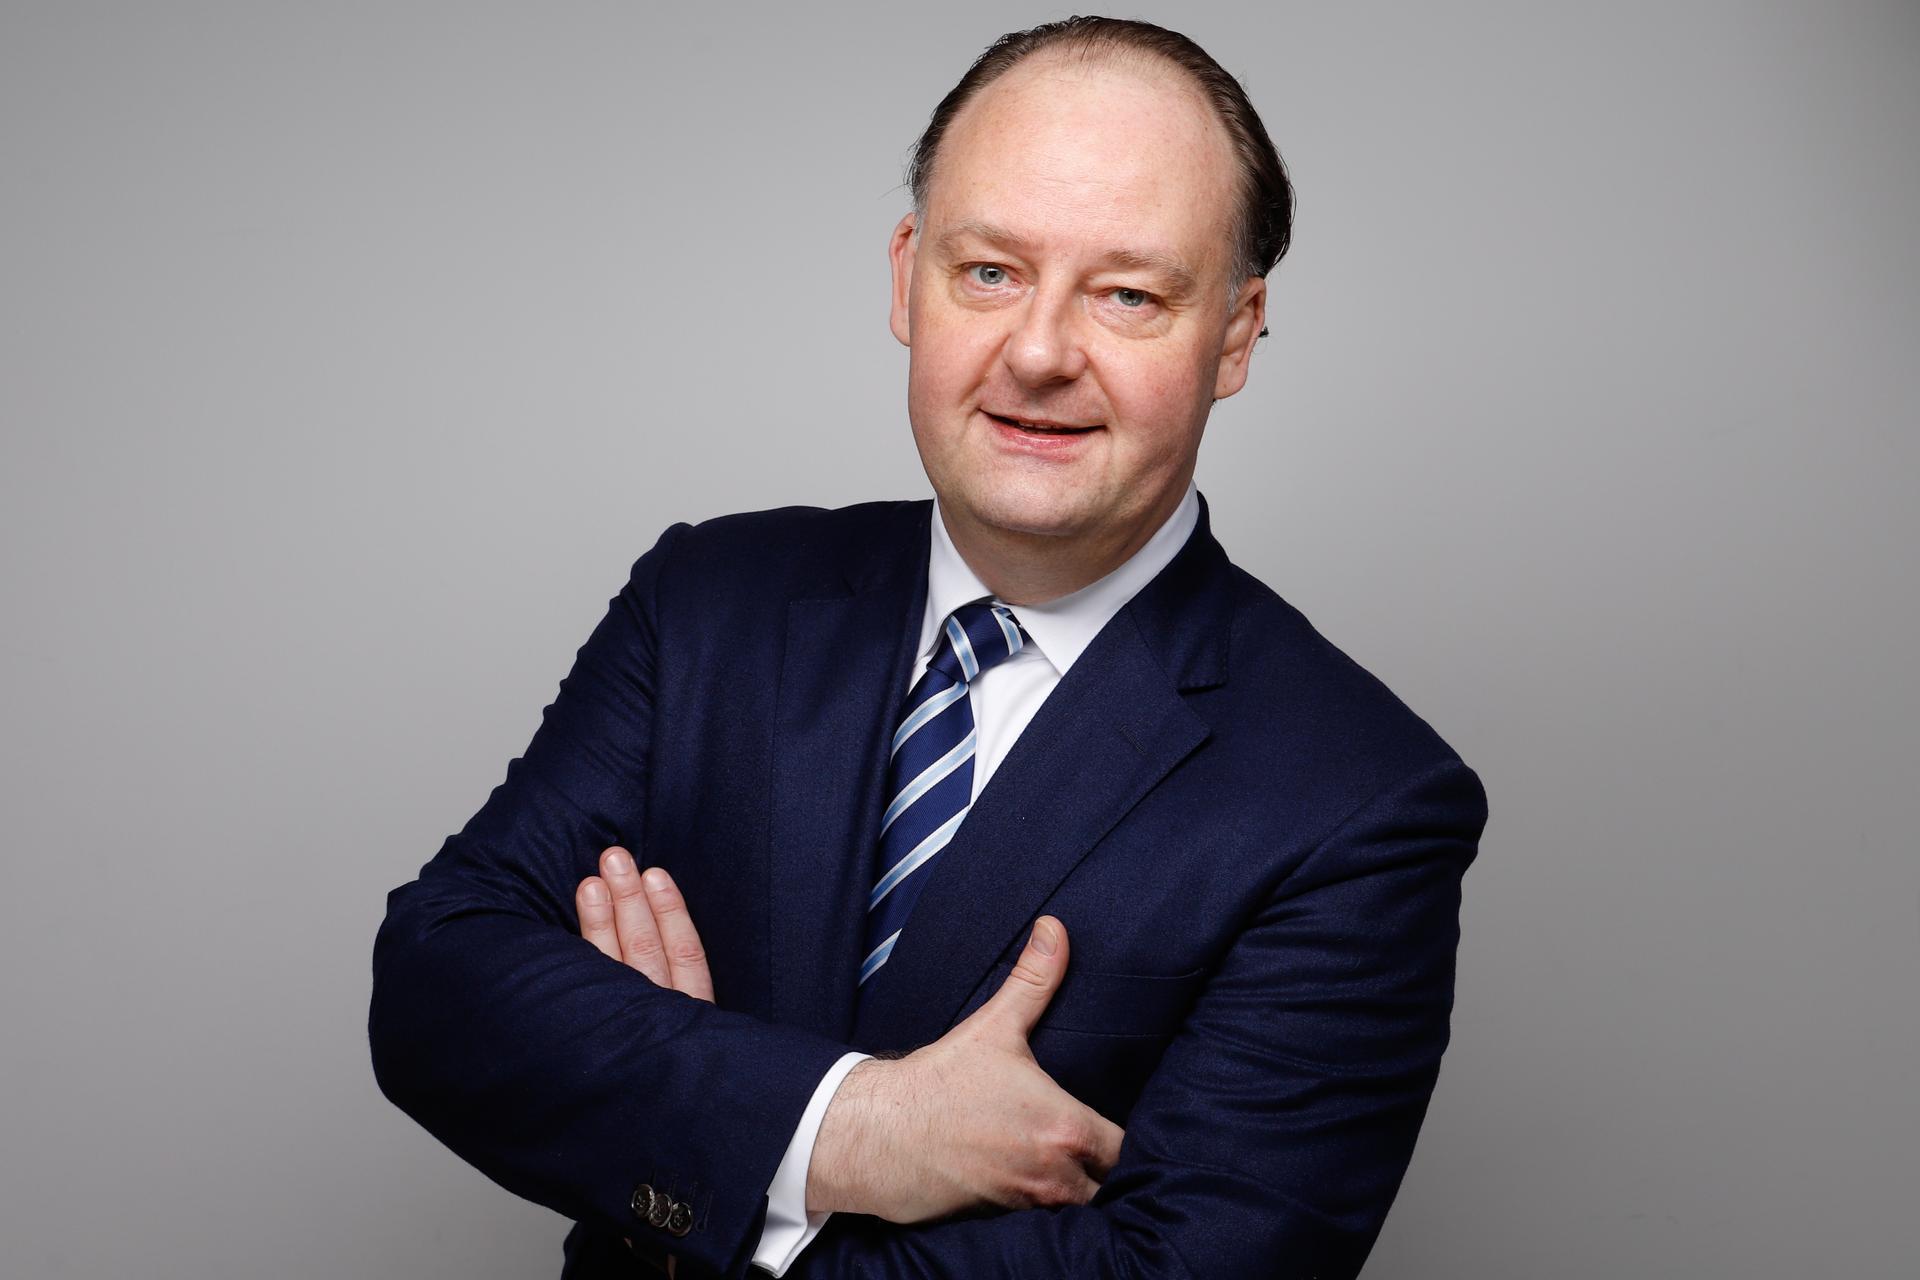 Patrick Sourek